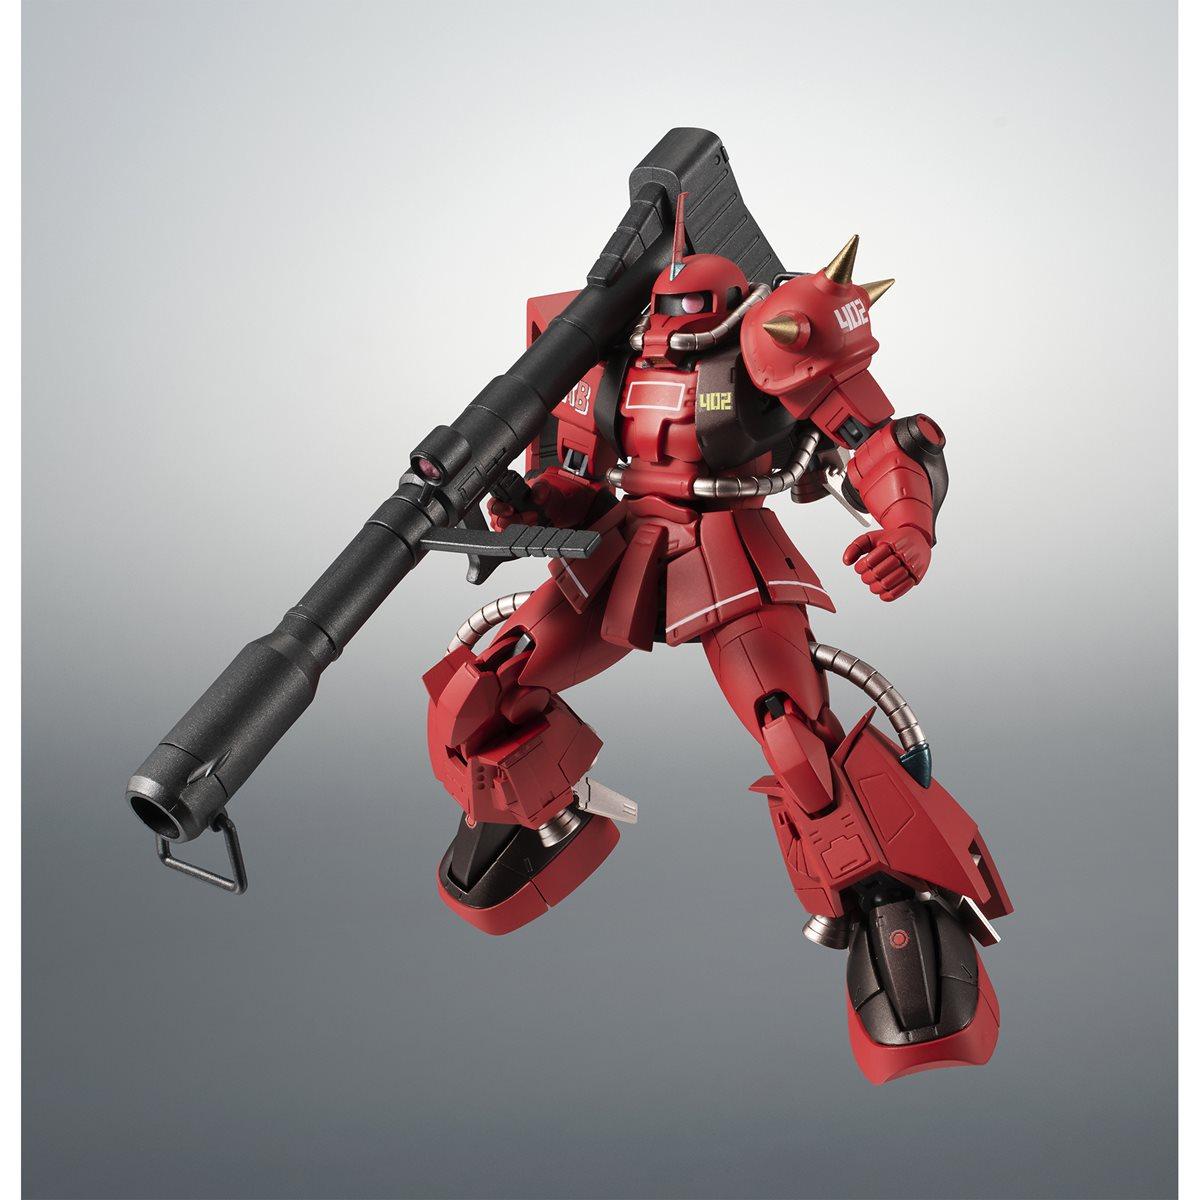 Robot Spirits MS-06R-2 Zaku II Johnny Ridden/'s Custom Ver BAS59098 A.N.I.M.E.